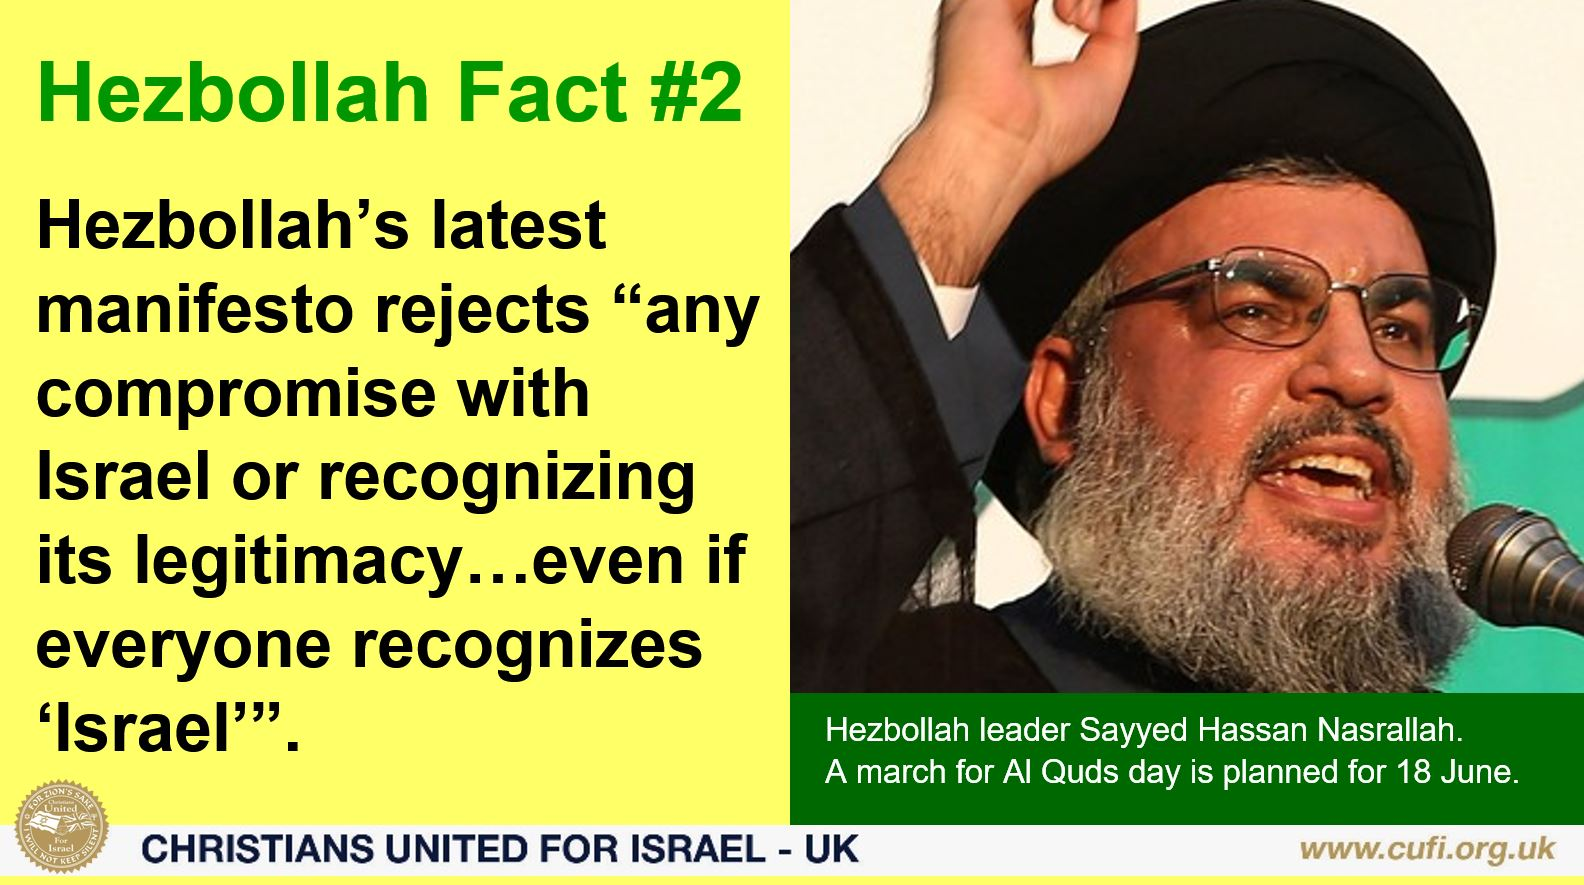 Hezbollah fac #2